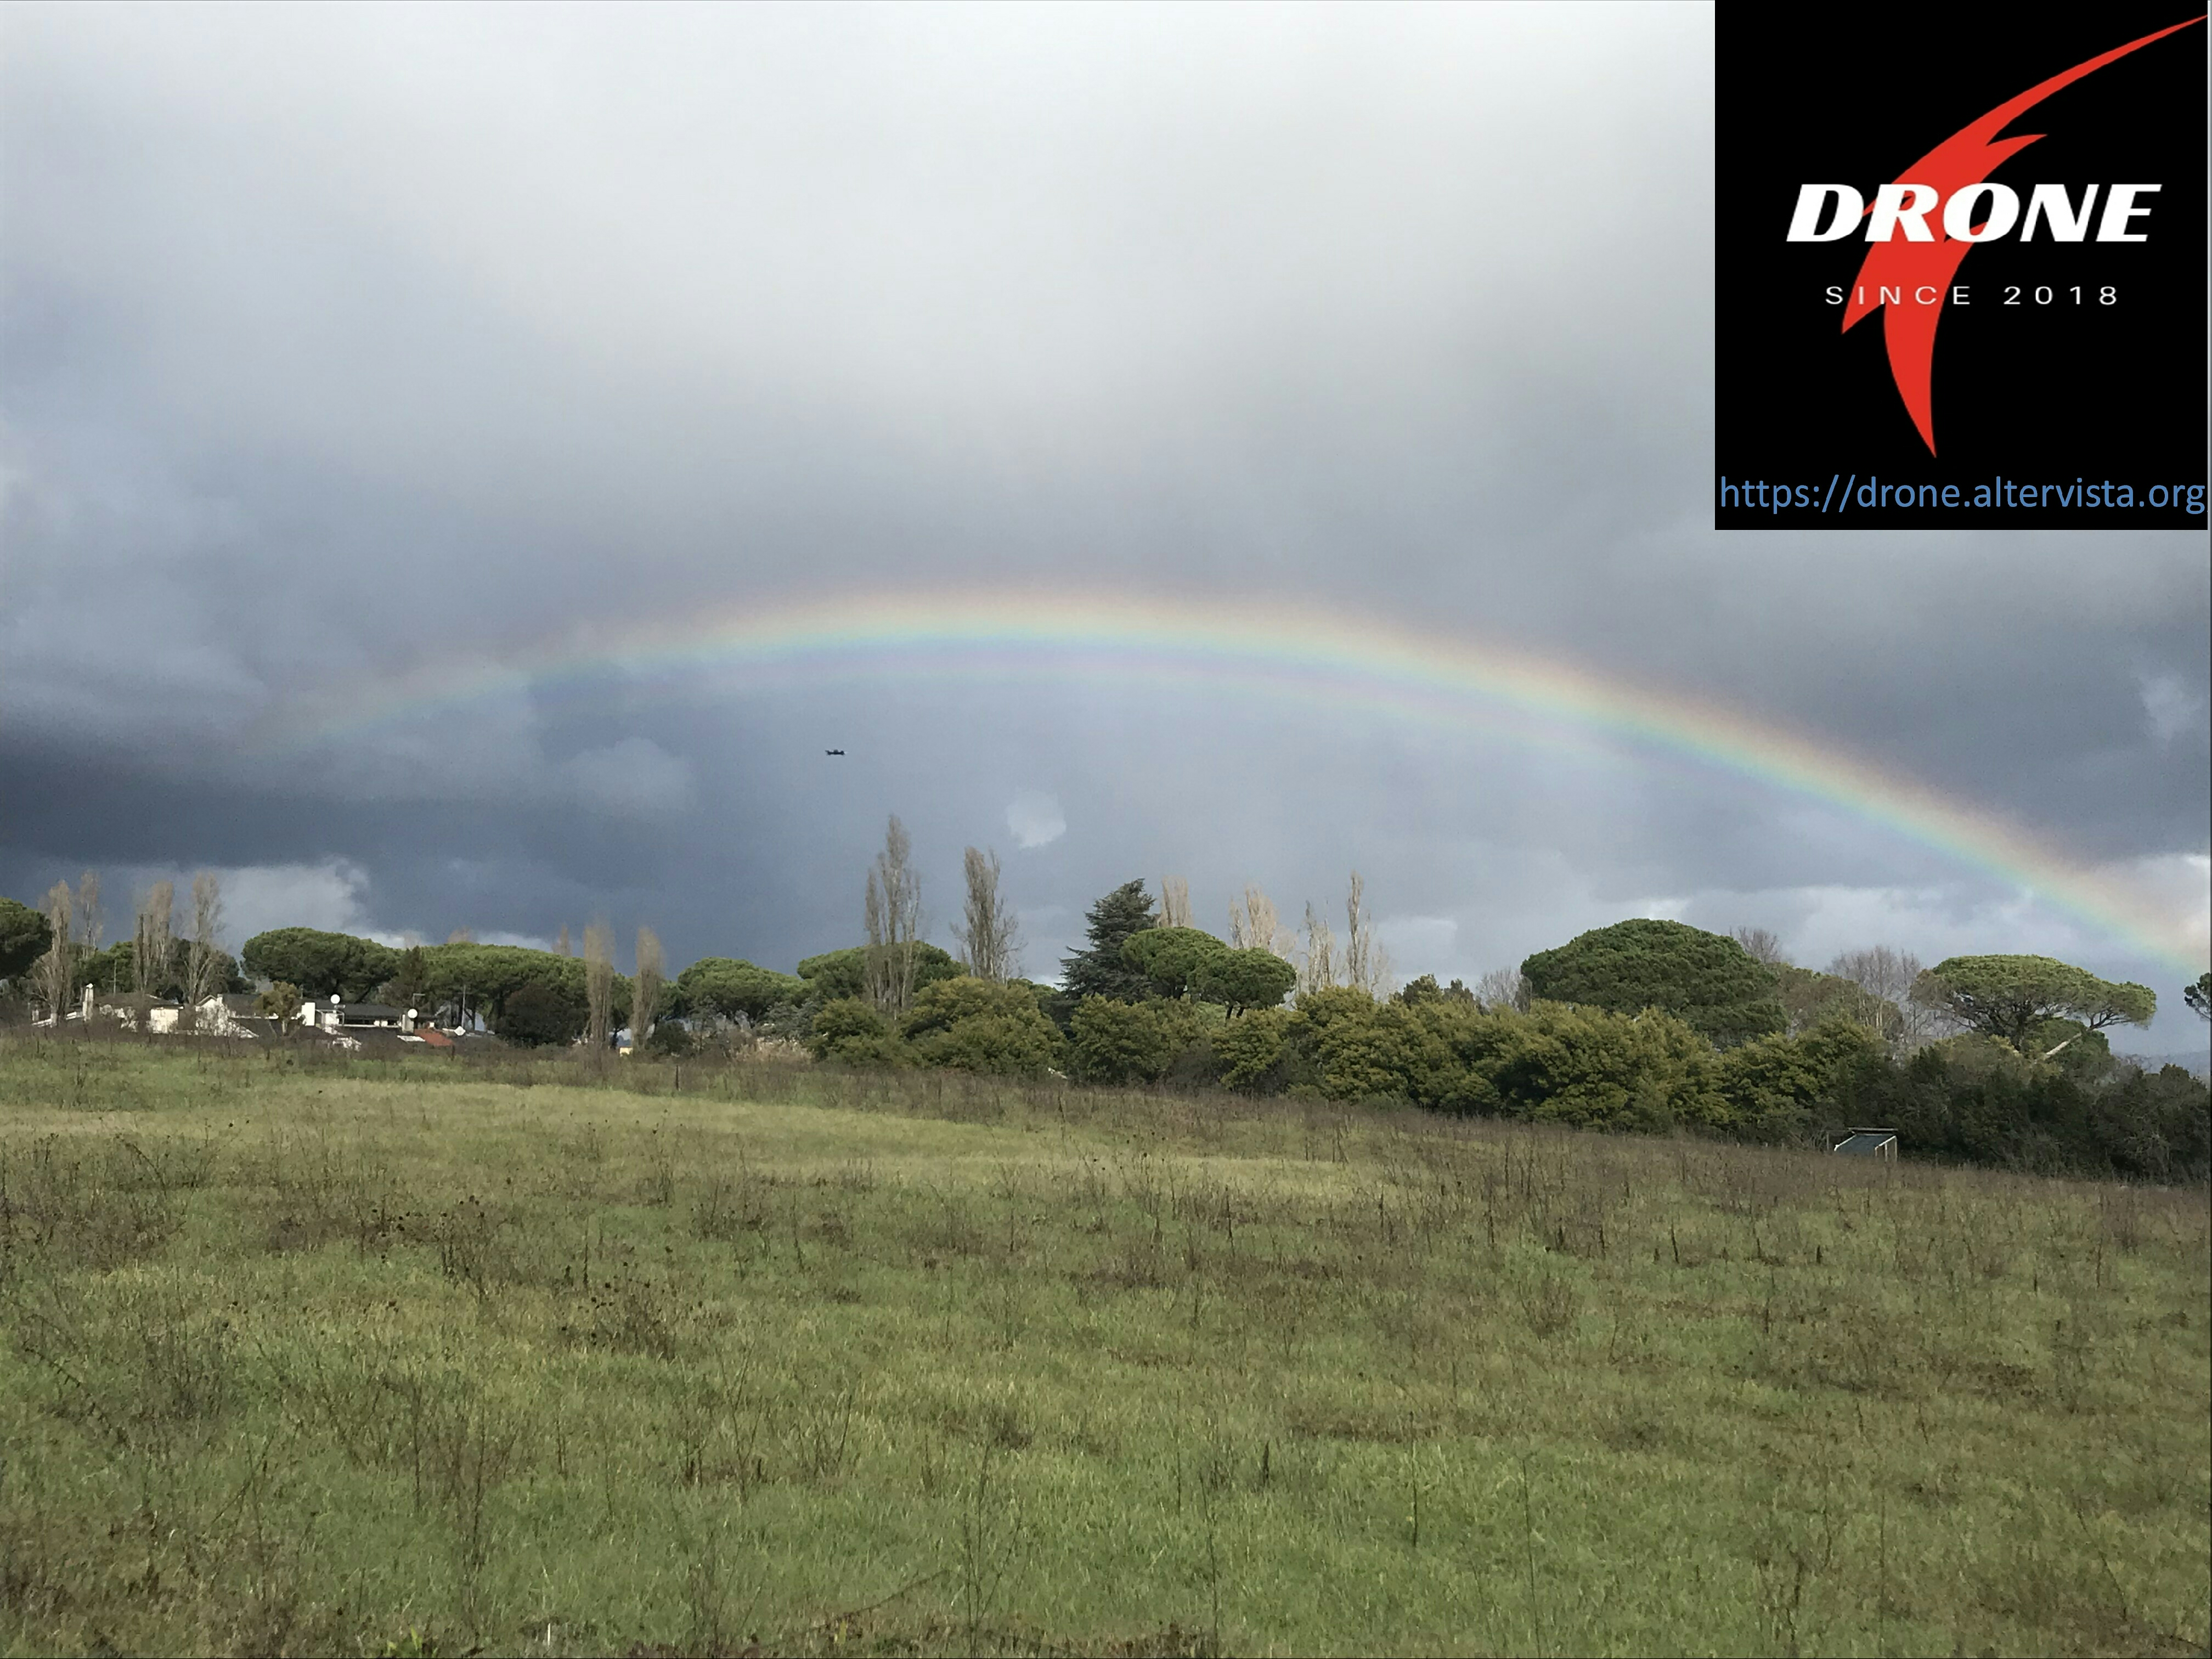 Volo drone con arcobaleno